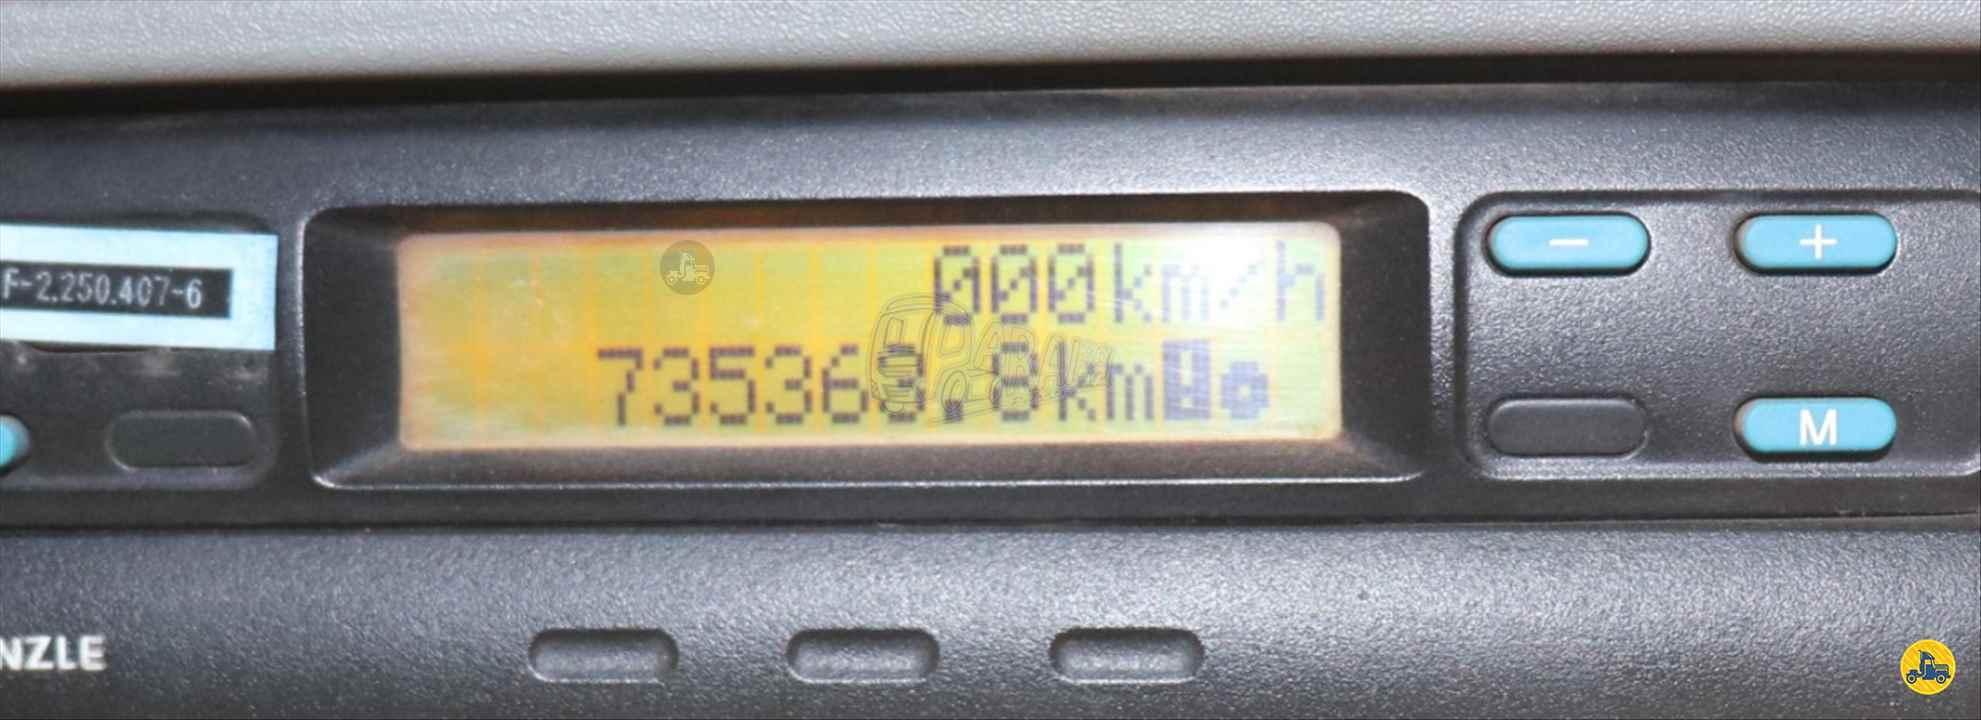 MERCEDES-BENZ MB 1933 0km 2010/2010 Paraíso Pesados